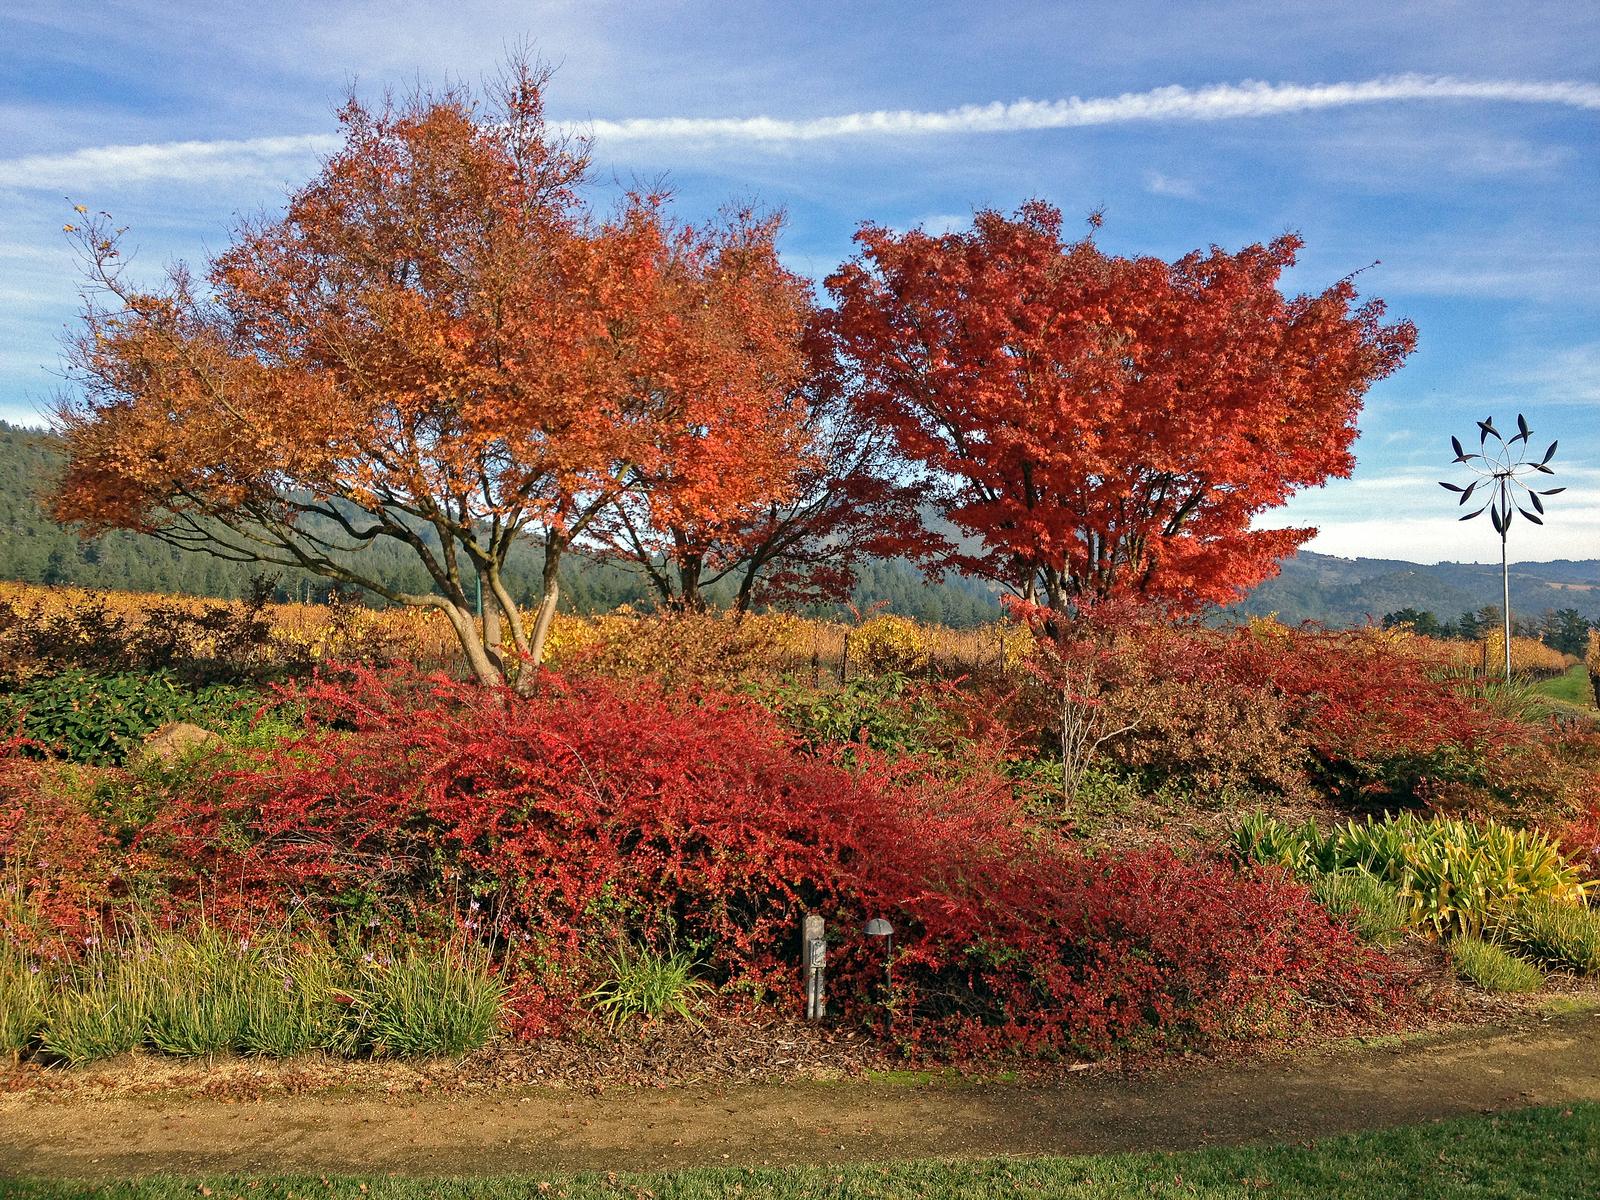 St. Francis winery, Kenwood, Sonoma County, California